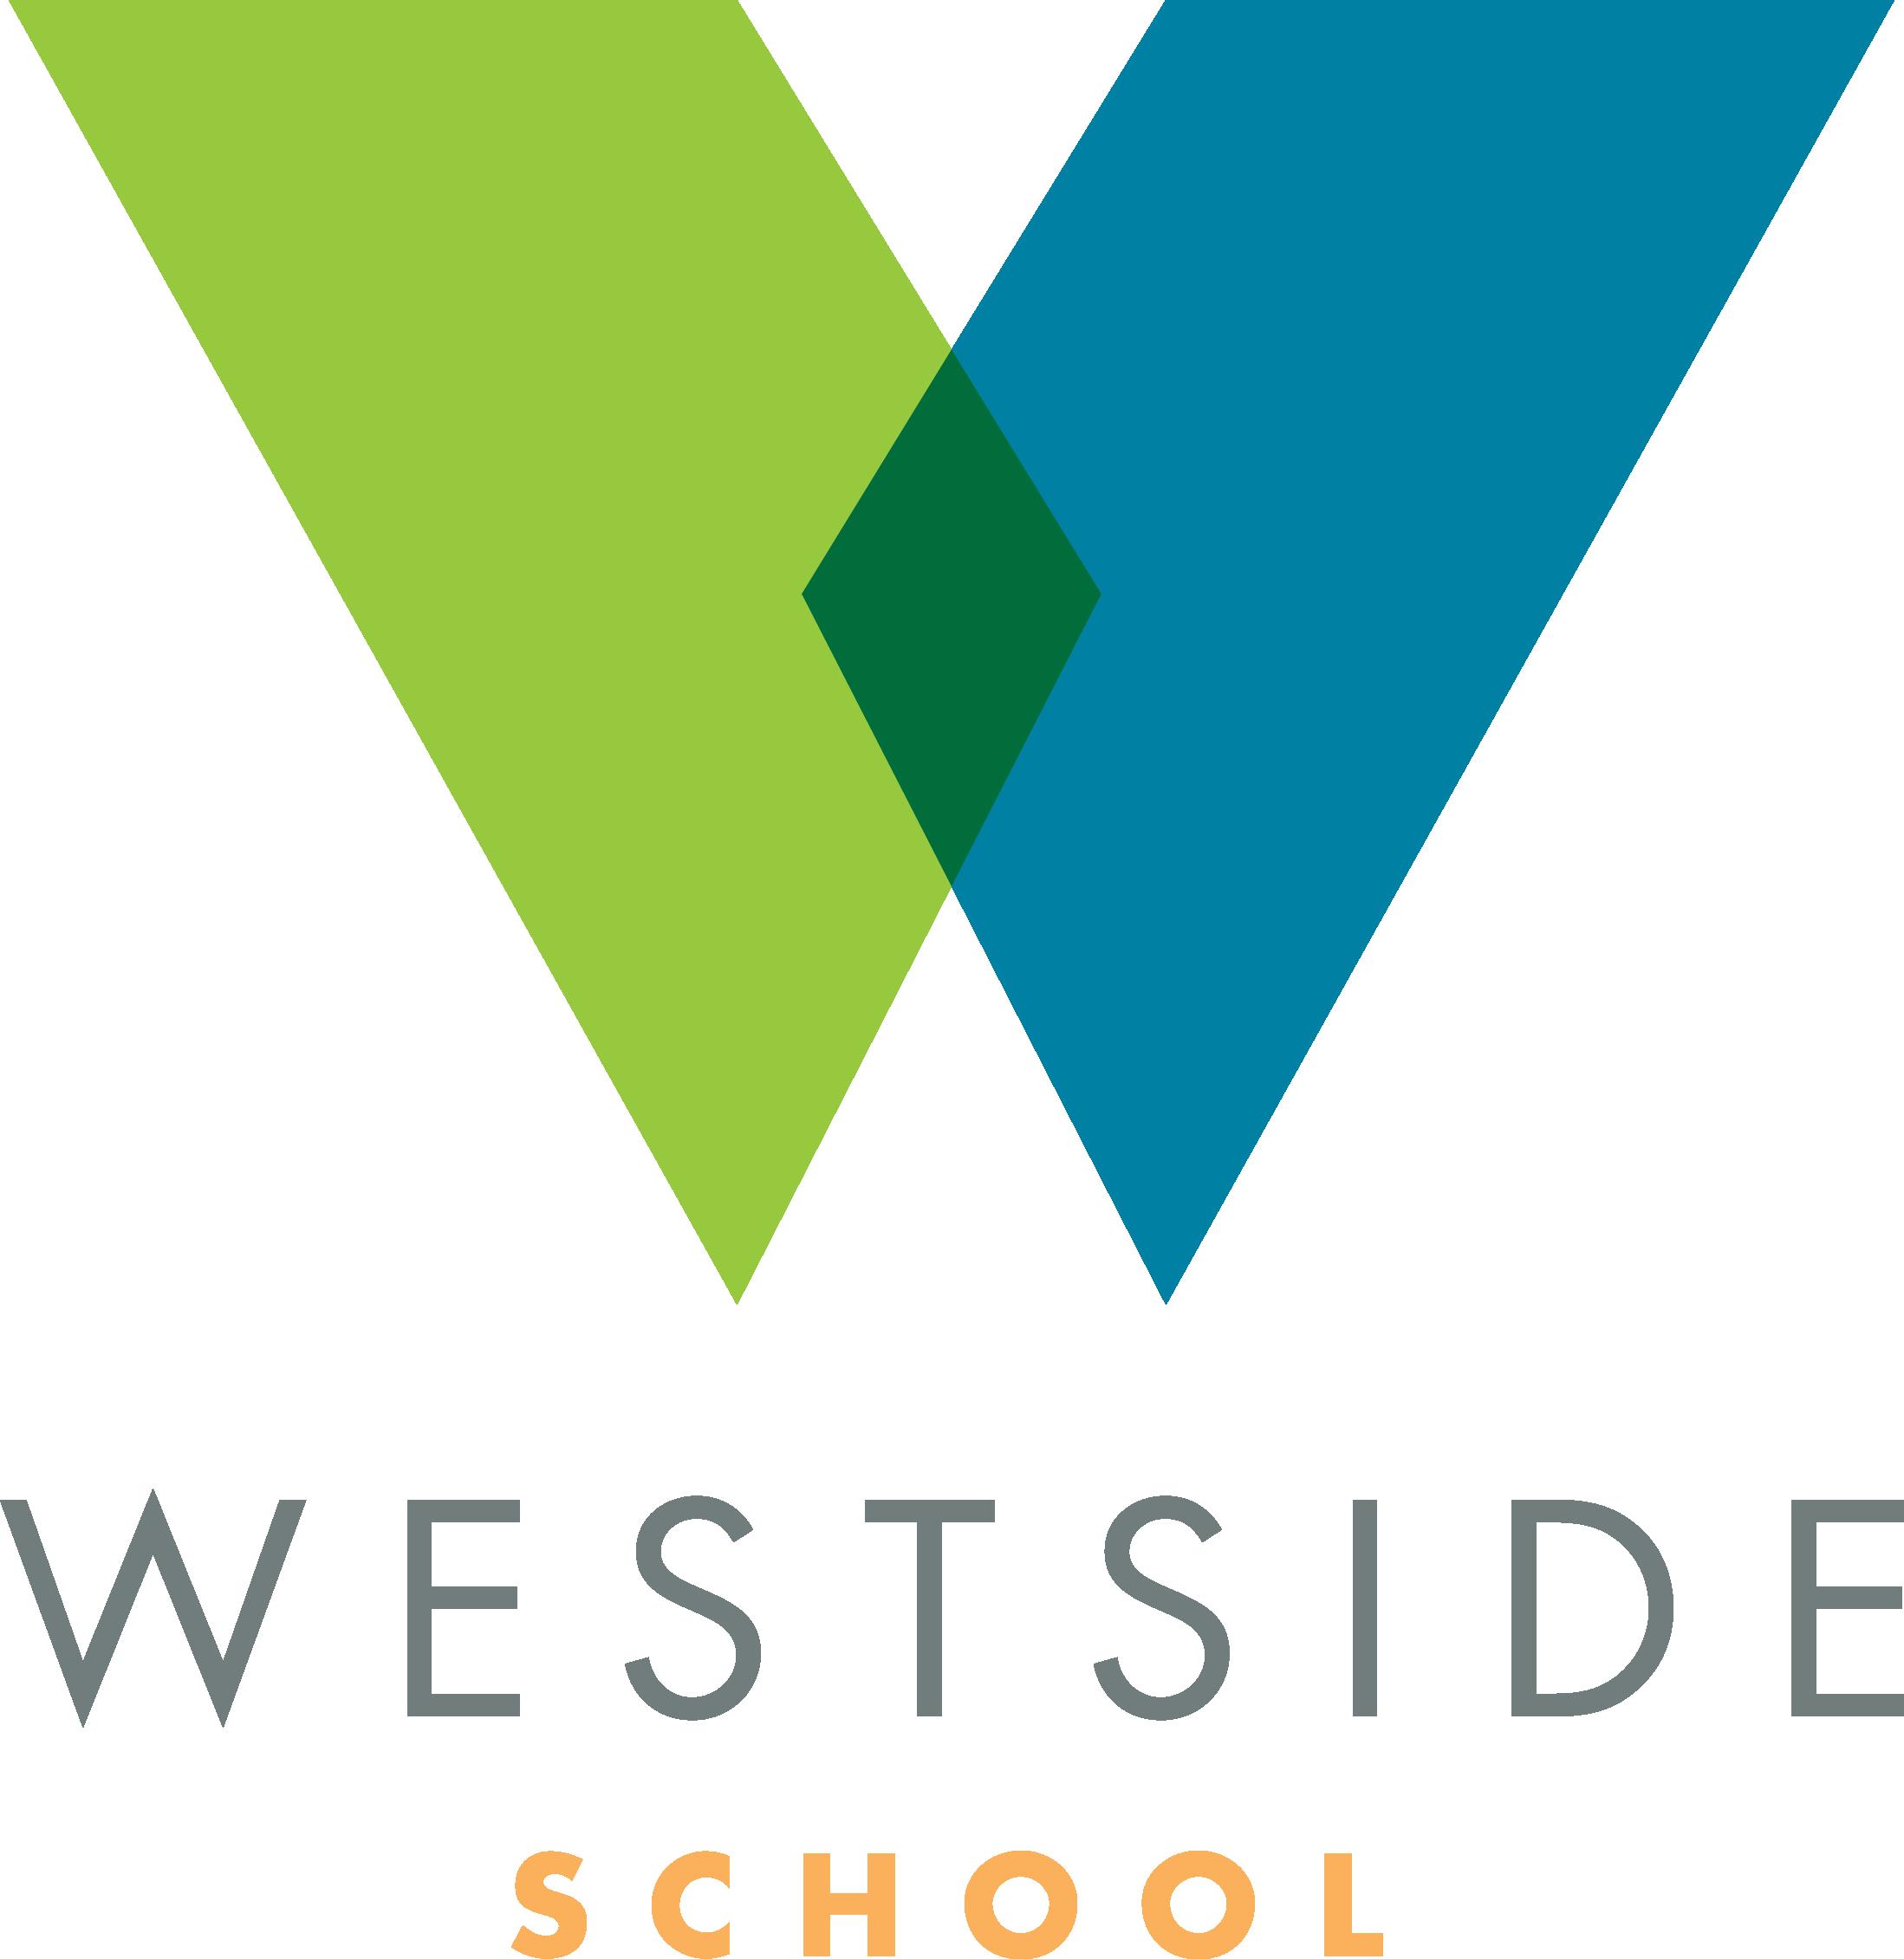 Westside School An Independent School In West Seattle